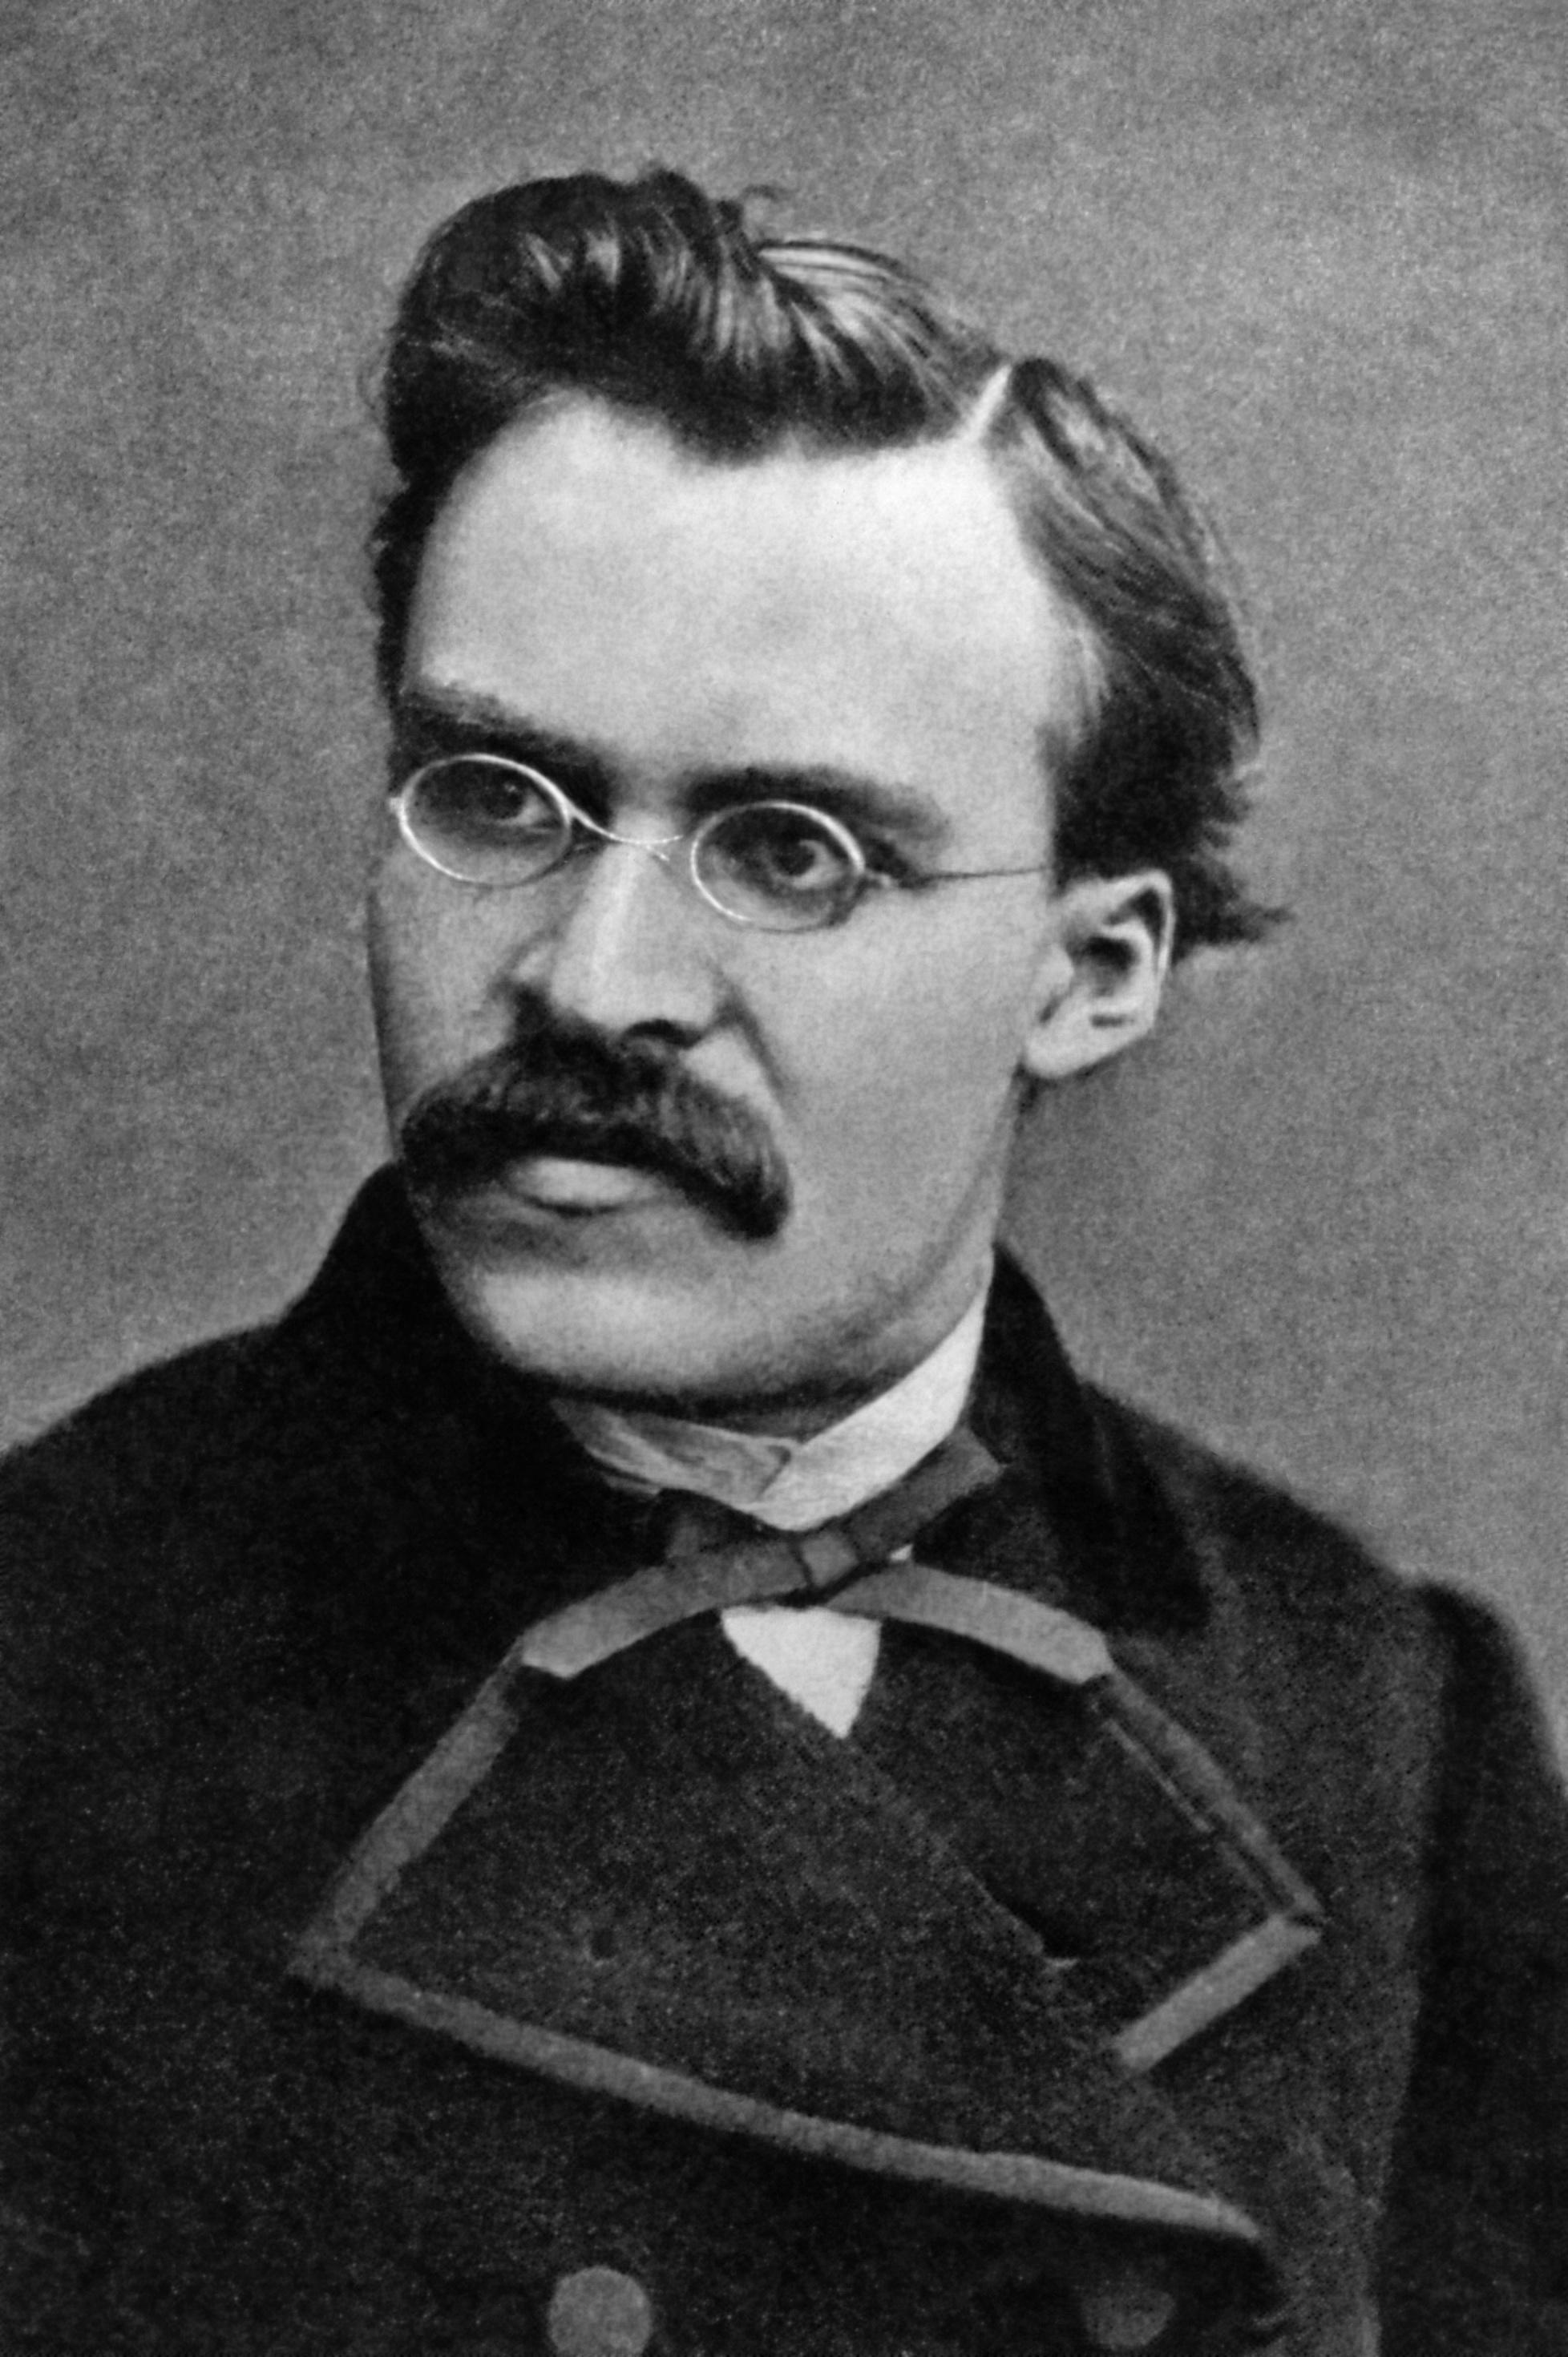 Retrato de Friedrich Nietzsche